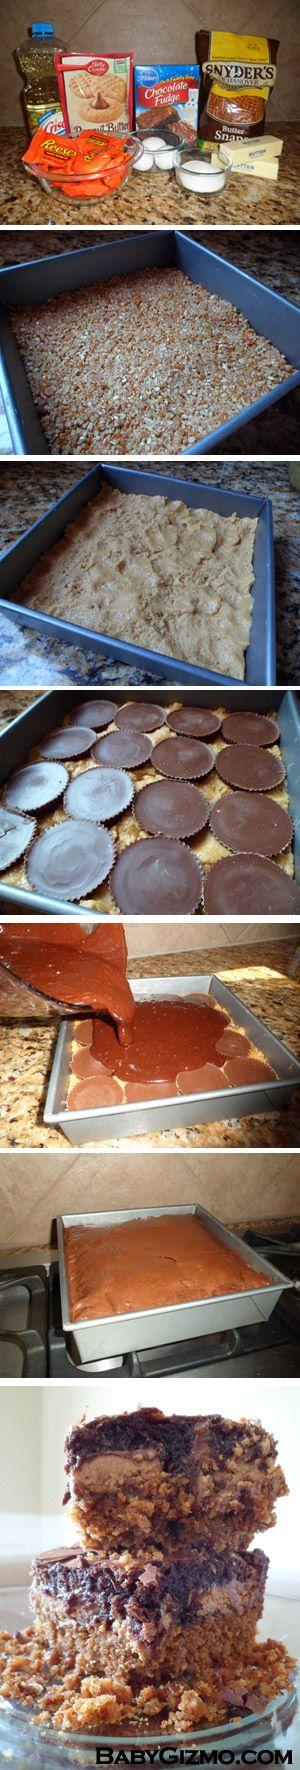 Ultimate Pretzel Crusted Peanut Butter Cookie Candy Brownie Bars: Pretzel Brownie, Candy Brownie, Pretzel Dessert, Pretzel Cookie